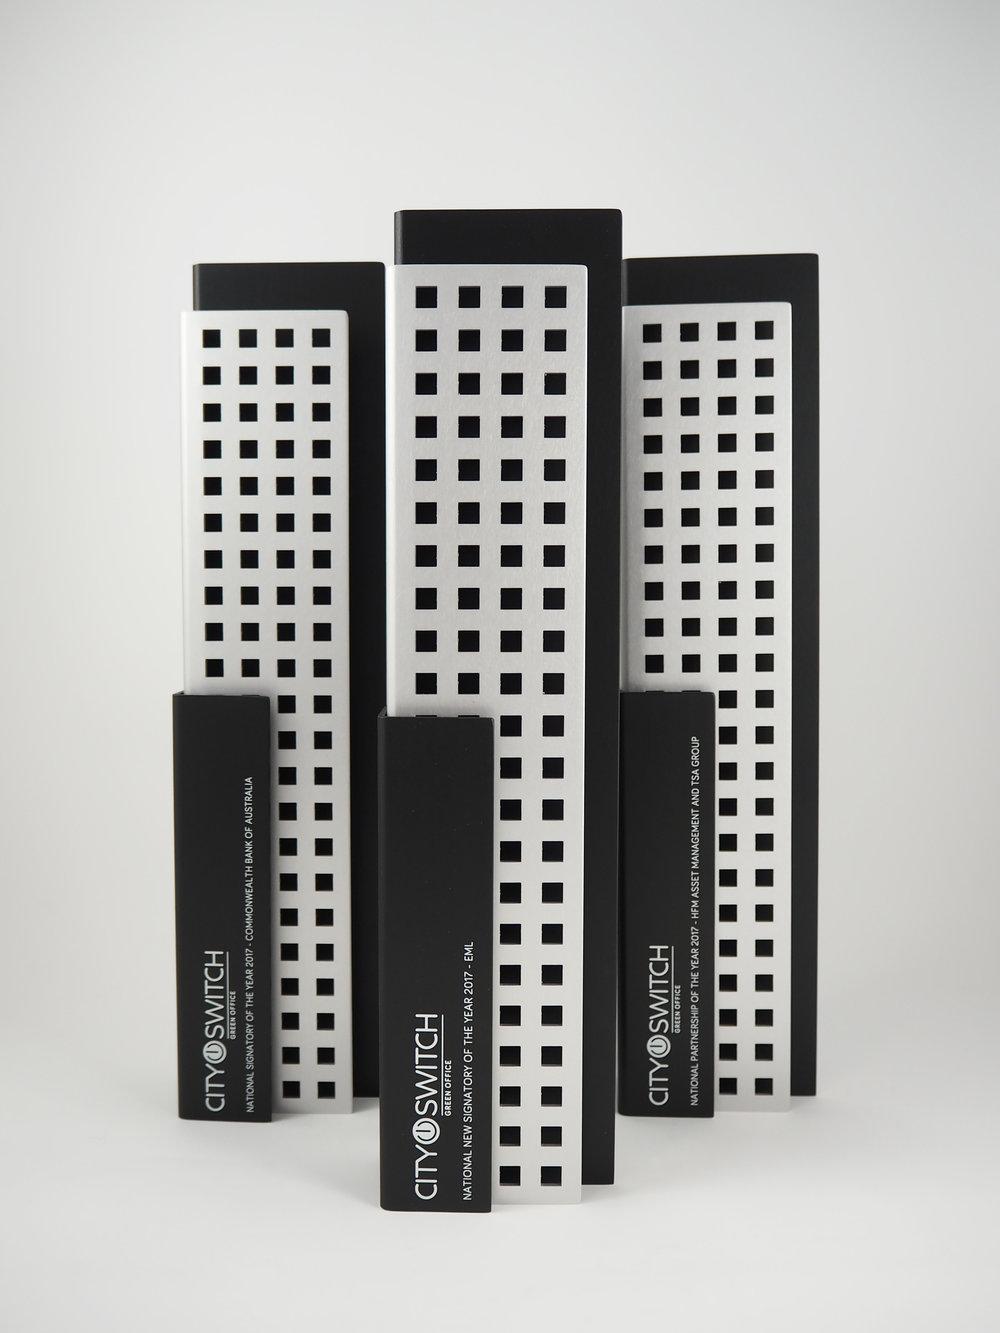 cityswitch-aluminium-corporate-trophy-award-03.jpg